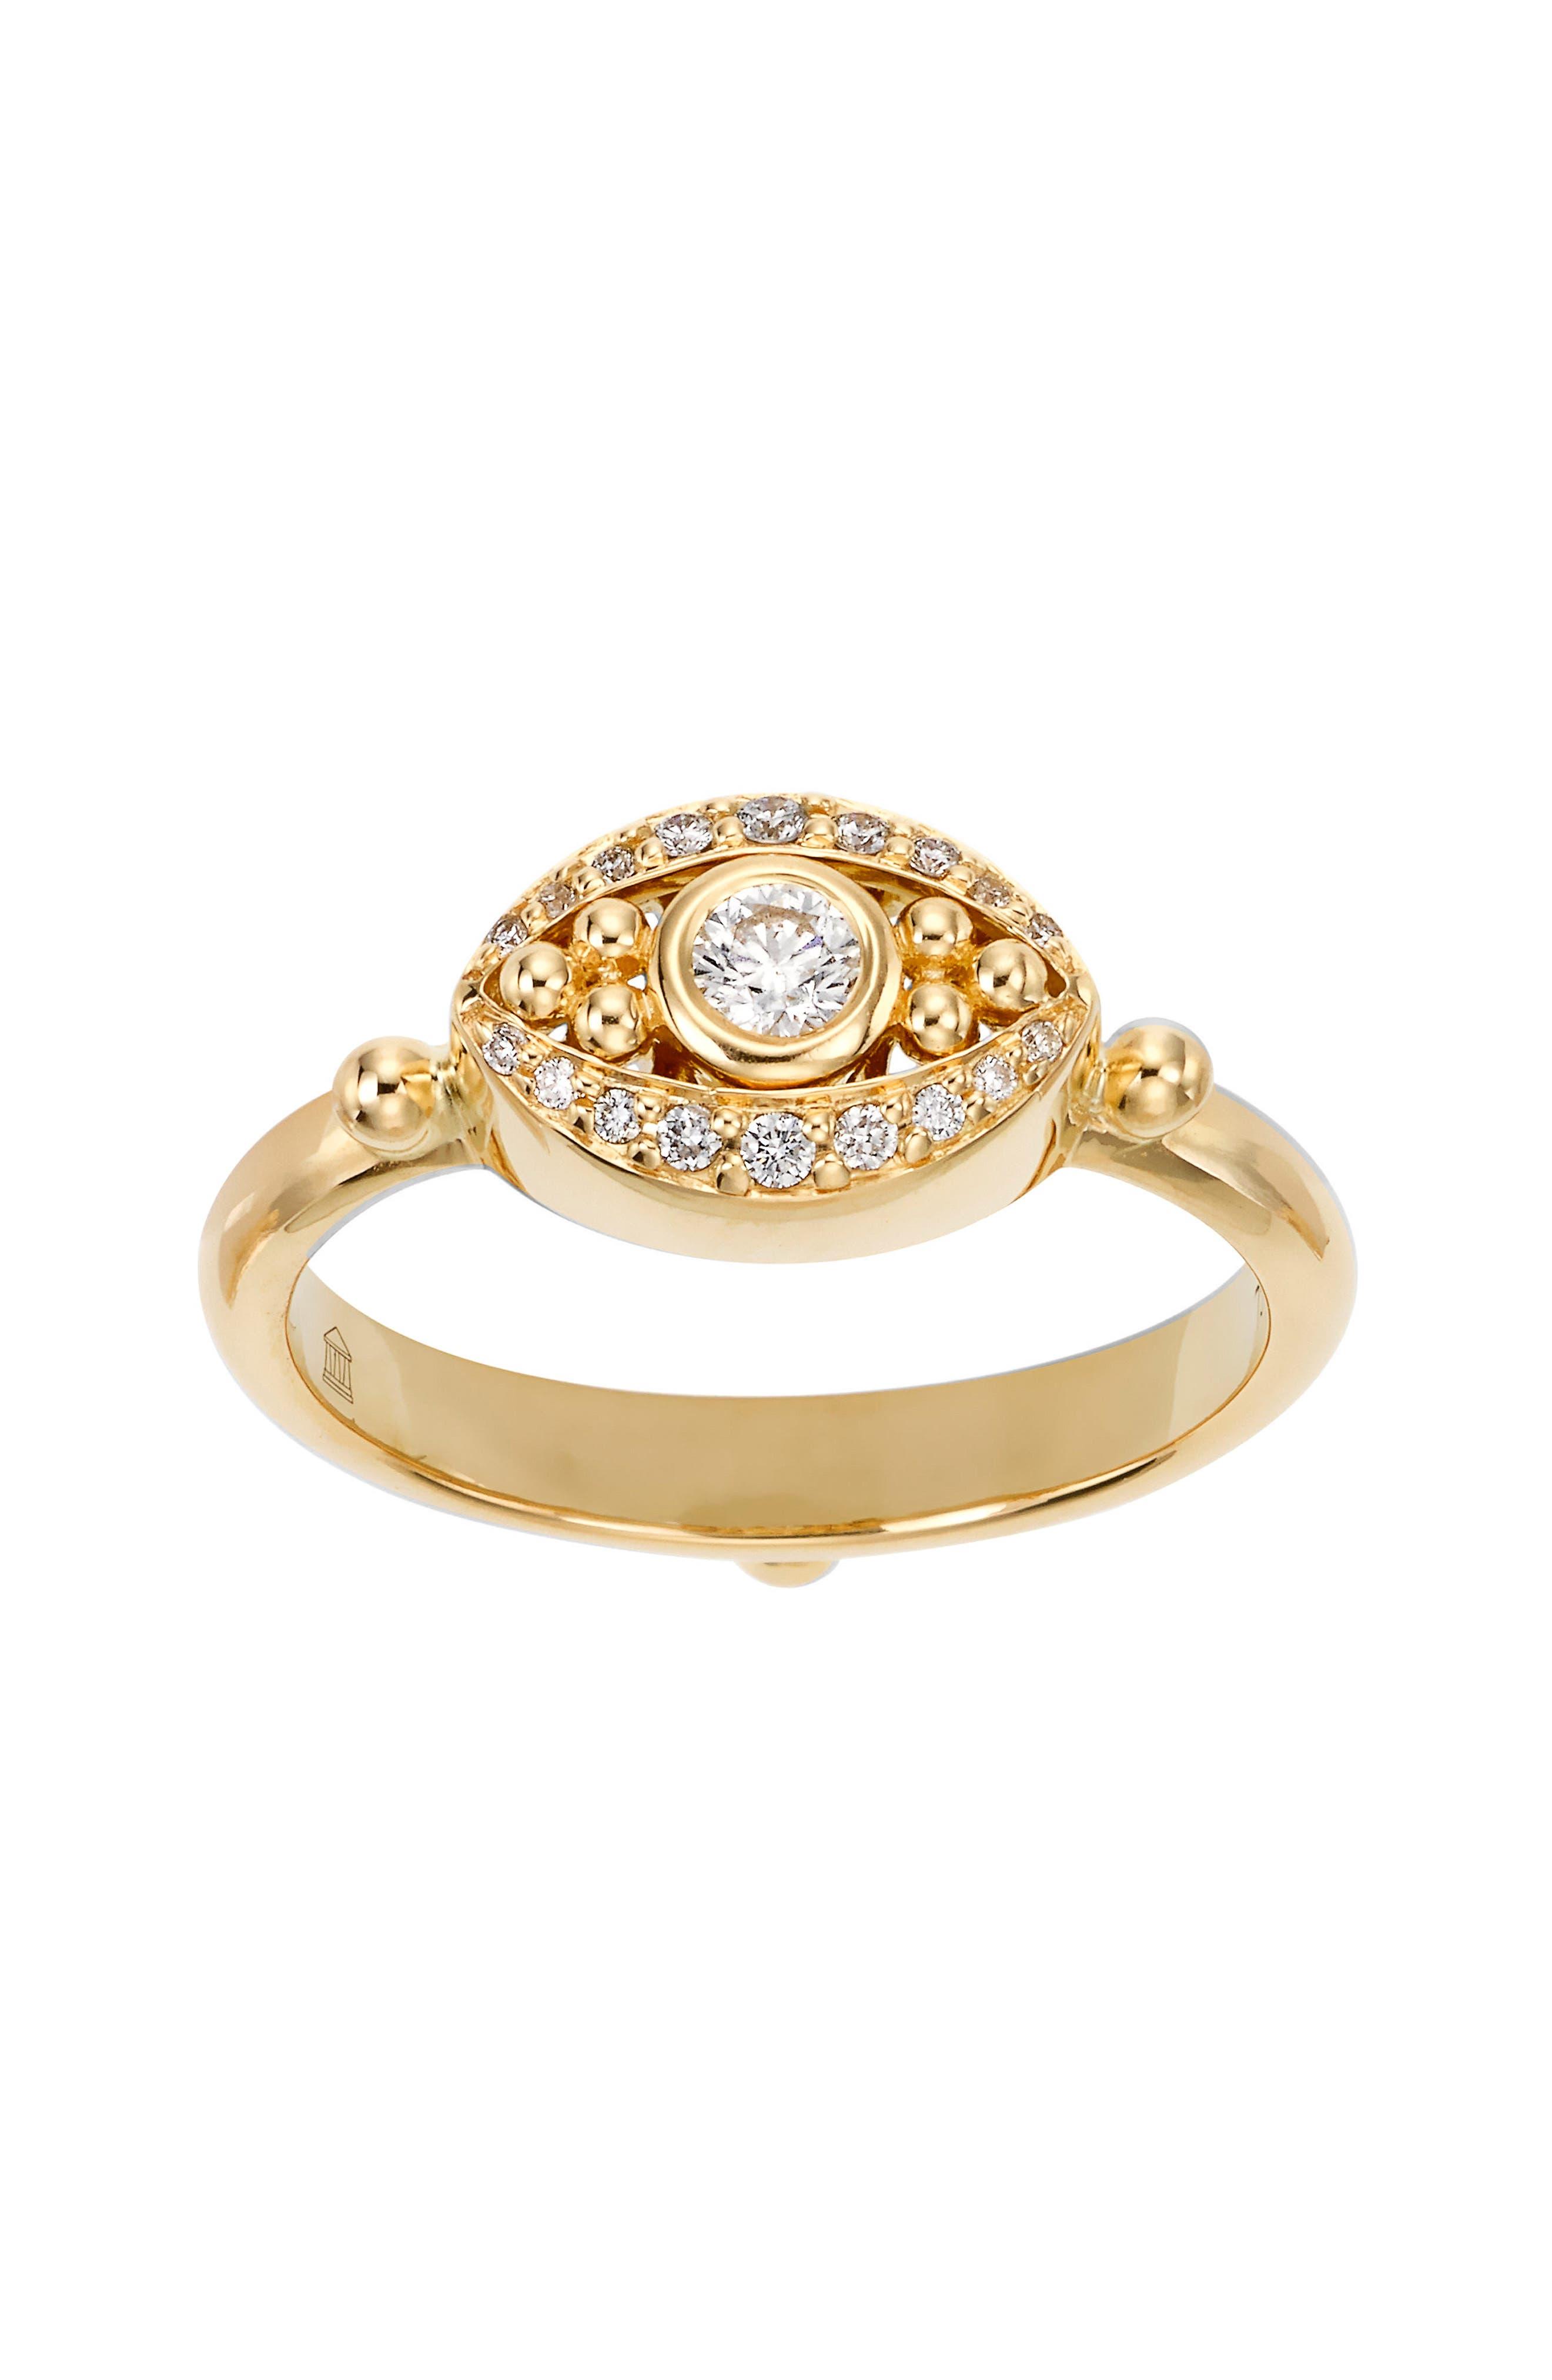 Temple St. Clair Diamond Evil Eye Ring,                             Main thumbnail 1, color,                             YELLOW GOLD